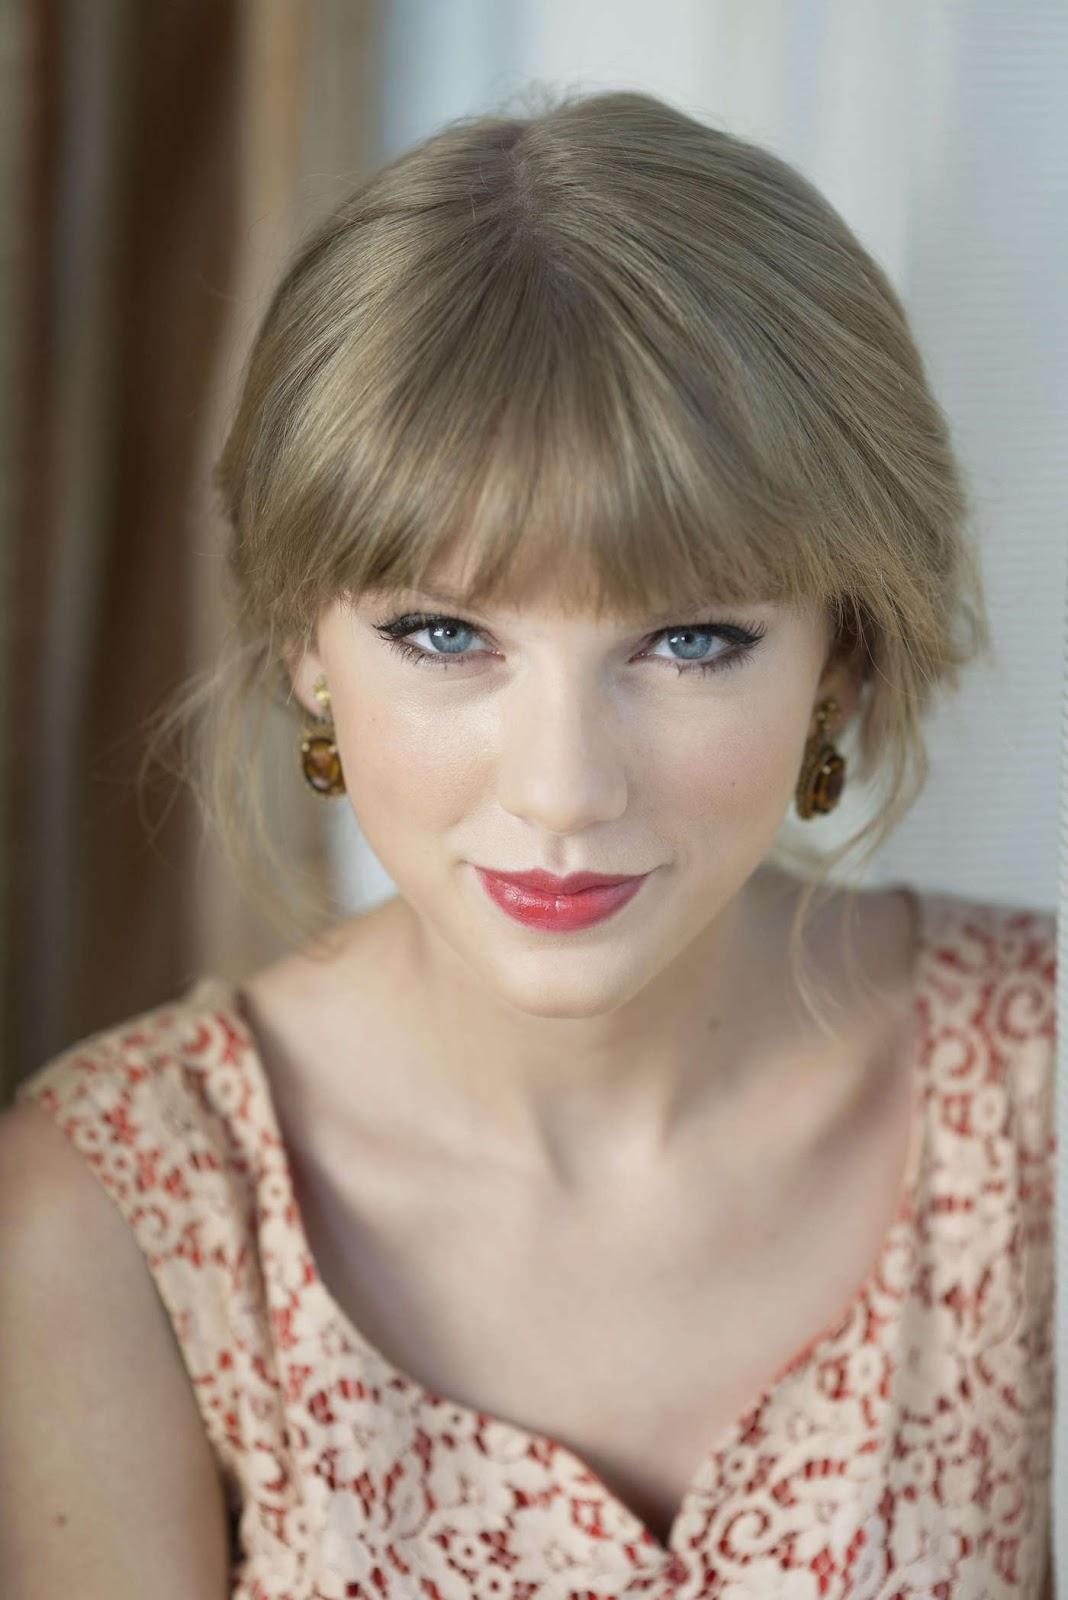 Taylor Swift In Christian Sinibaldi 2012 Photoshoot World Actress Photos Bollywood Hollywood Hot Actress Photos